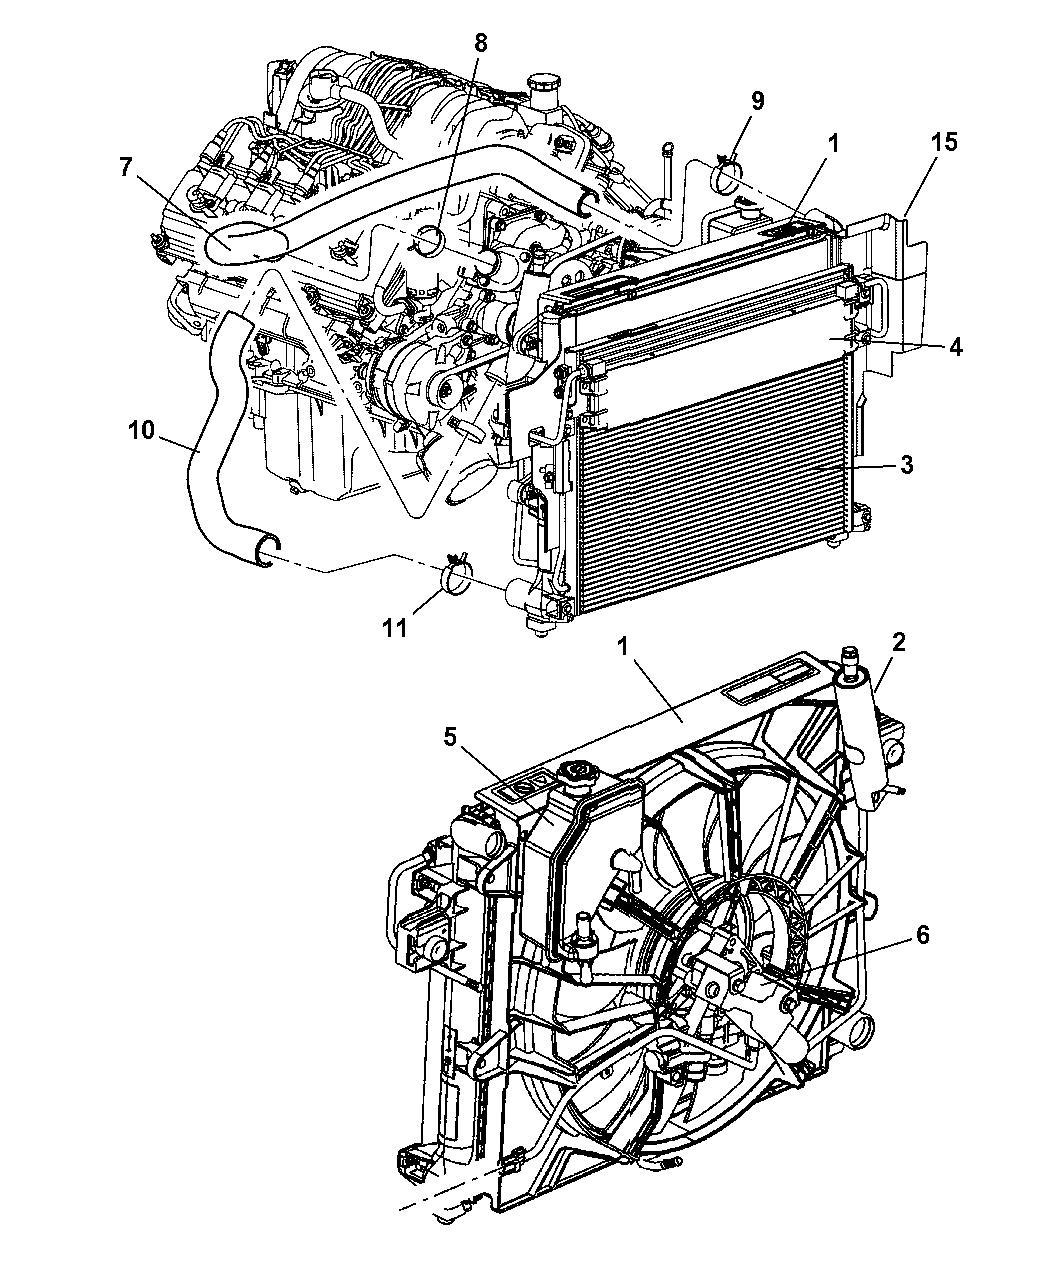 2005 jeep grand cherokee radiator & related parts